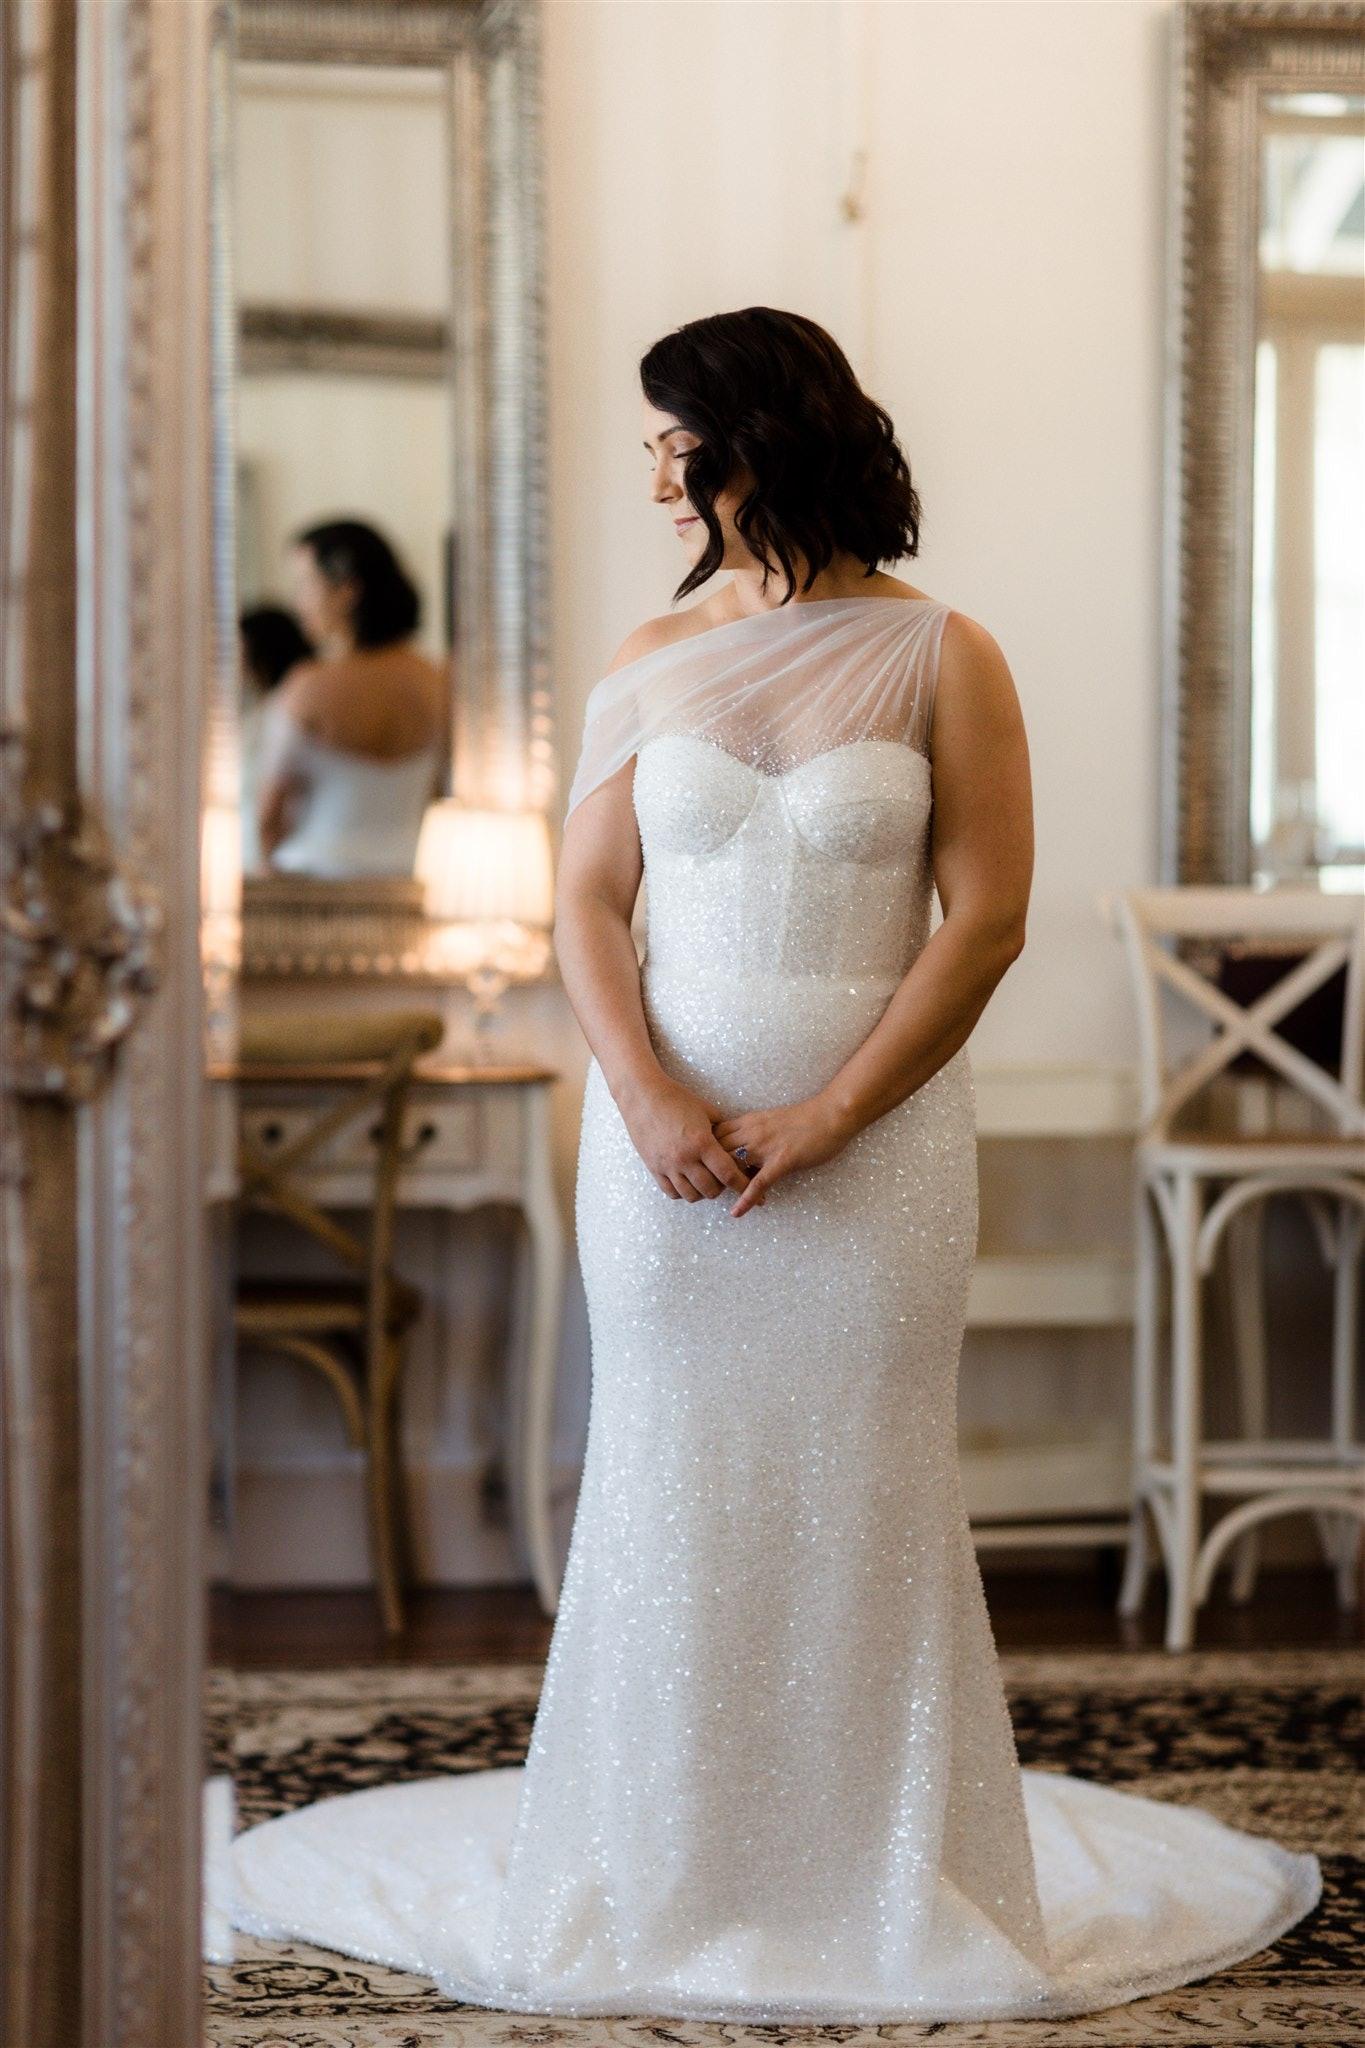 Bride in Bride's Retreat posing in sequinned dress